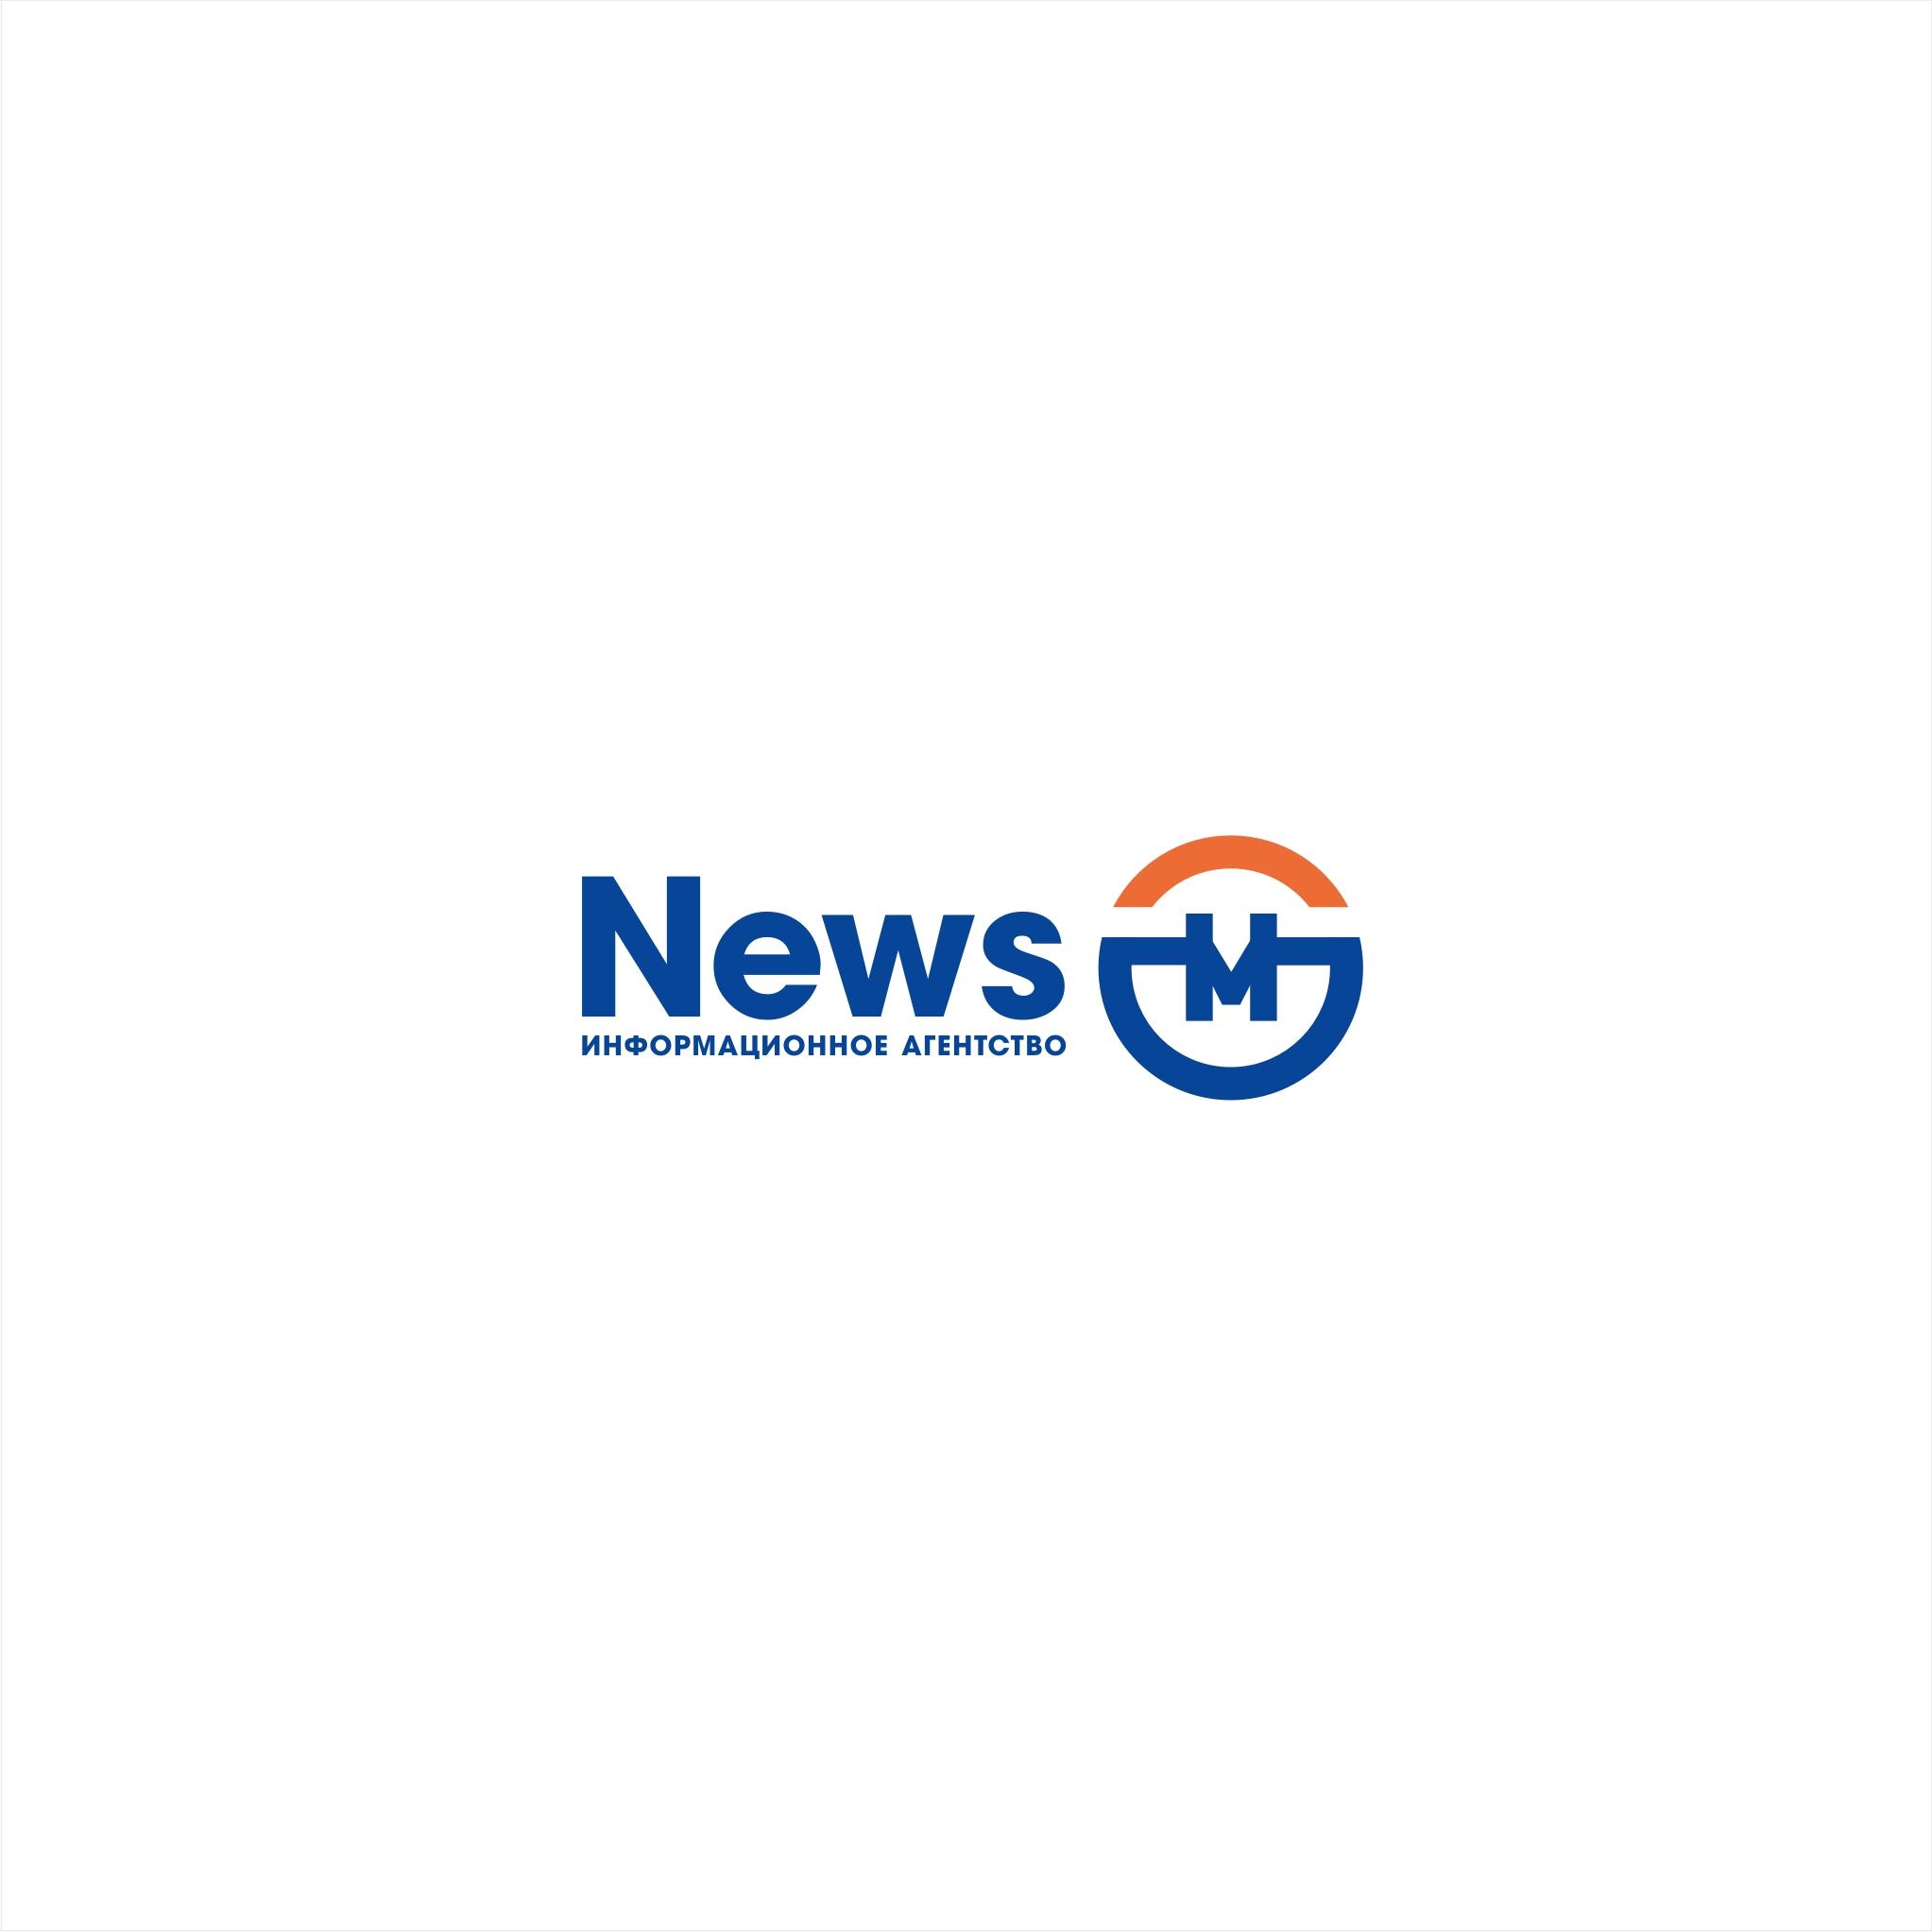 Логотип для информационного агентства фото f_4005aa6bf8a487c1.jpg